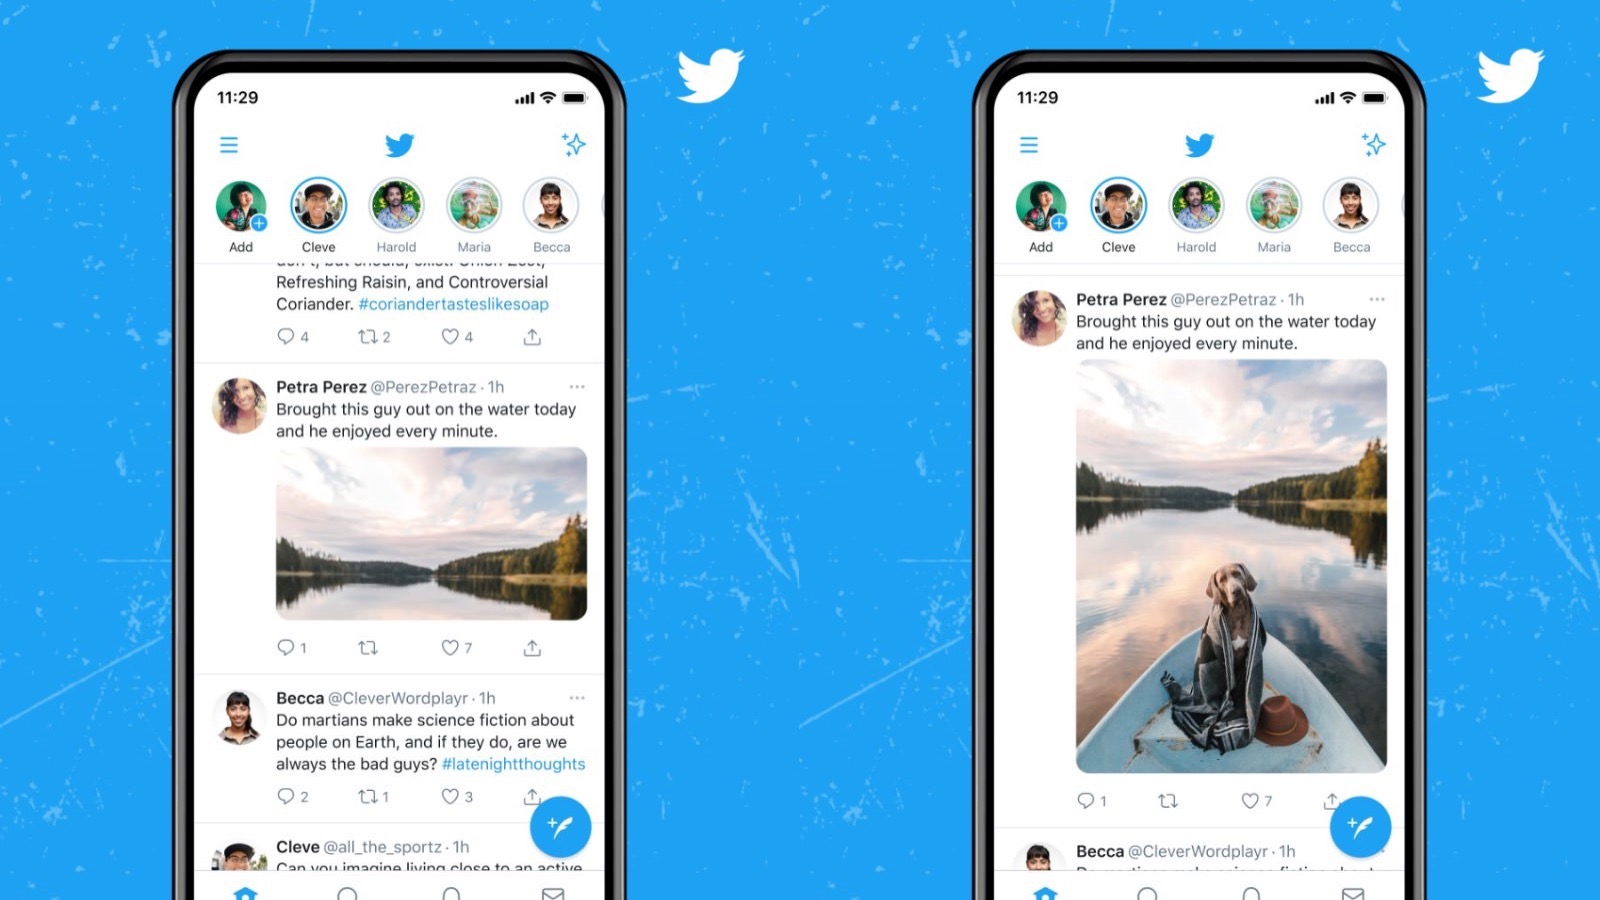 Twitter Full Size Previews